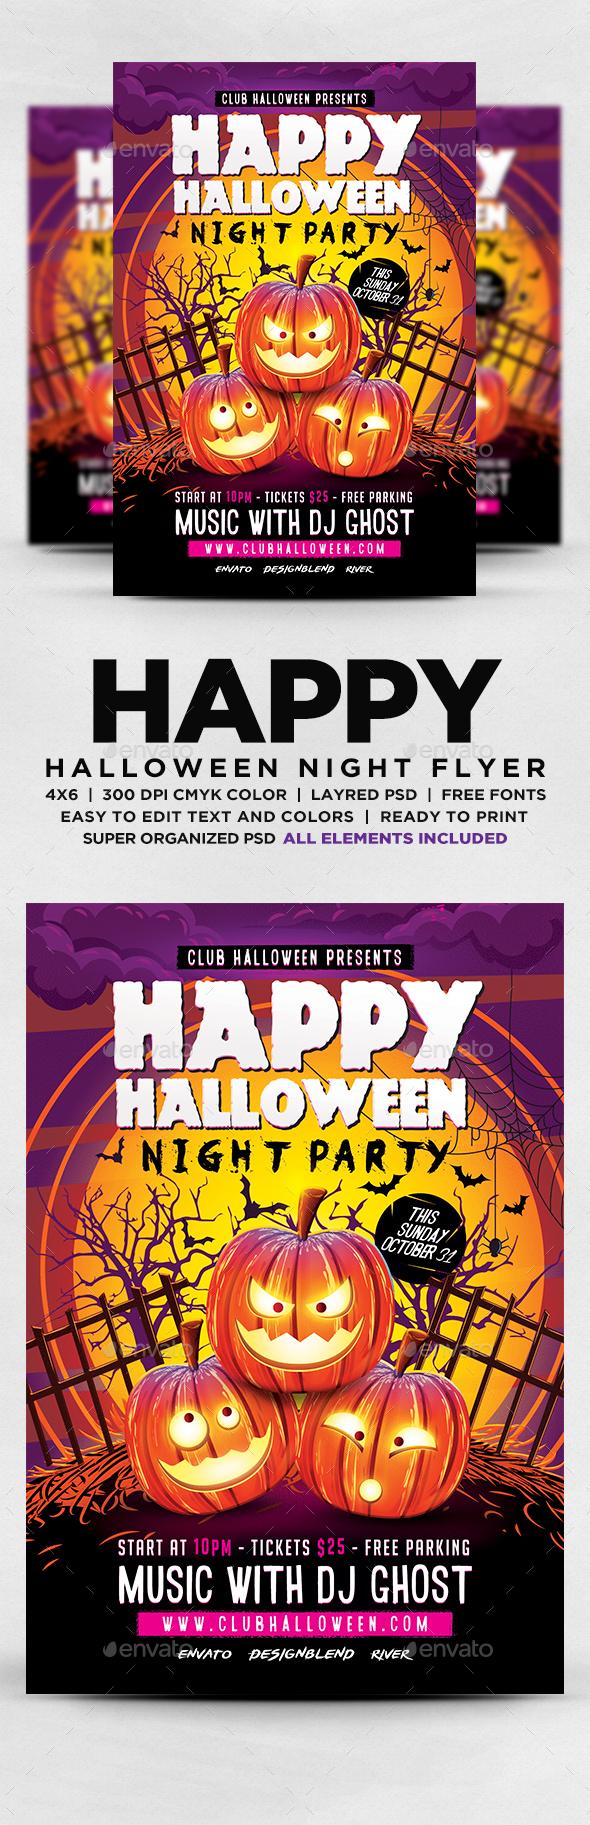 Halloween Night Party Flyer - Flyers Print Templates